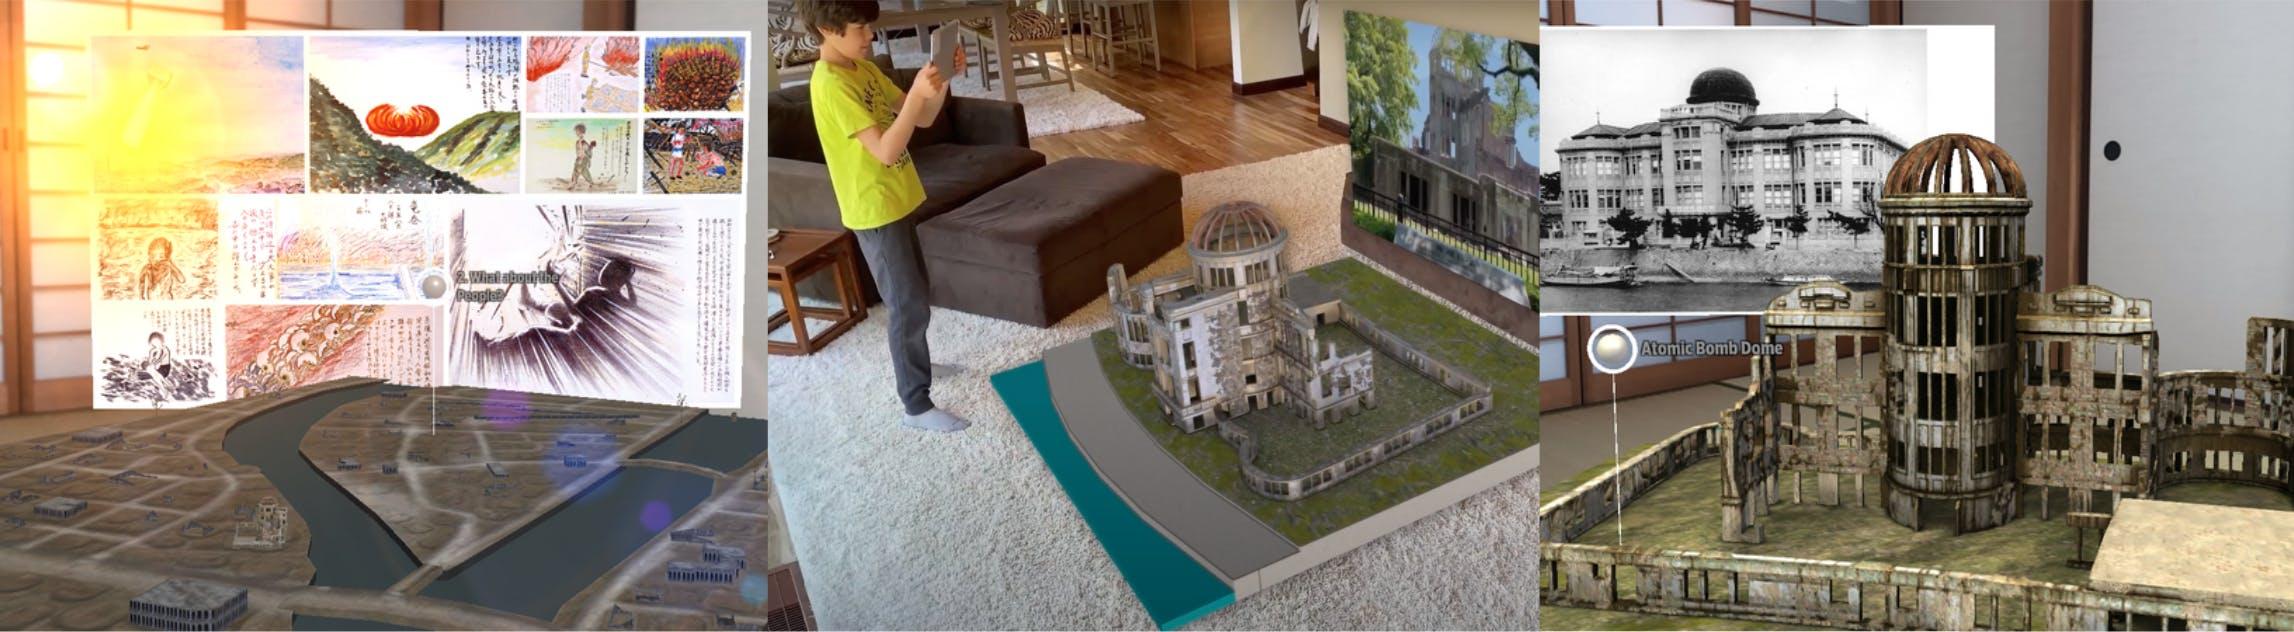 ARで広島平和記念公園を巡るアプリ!「XPLORE HIROSHIMA」リリース